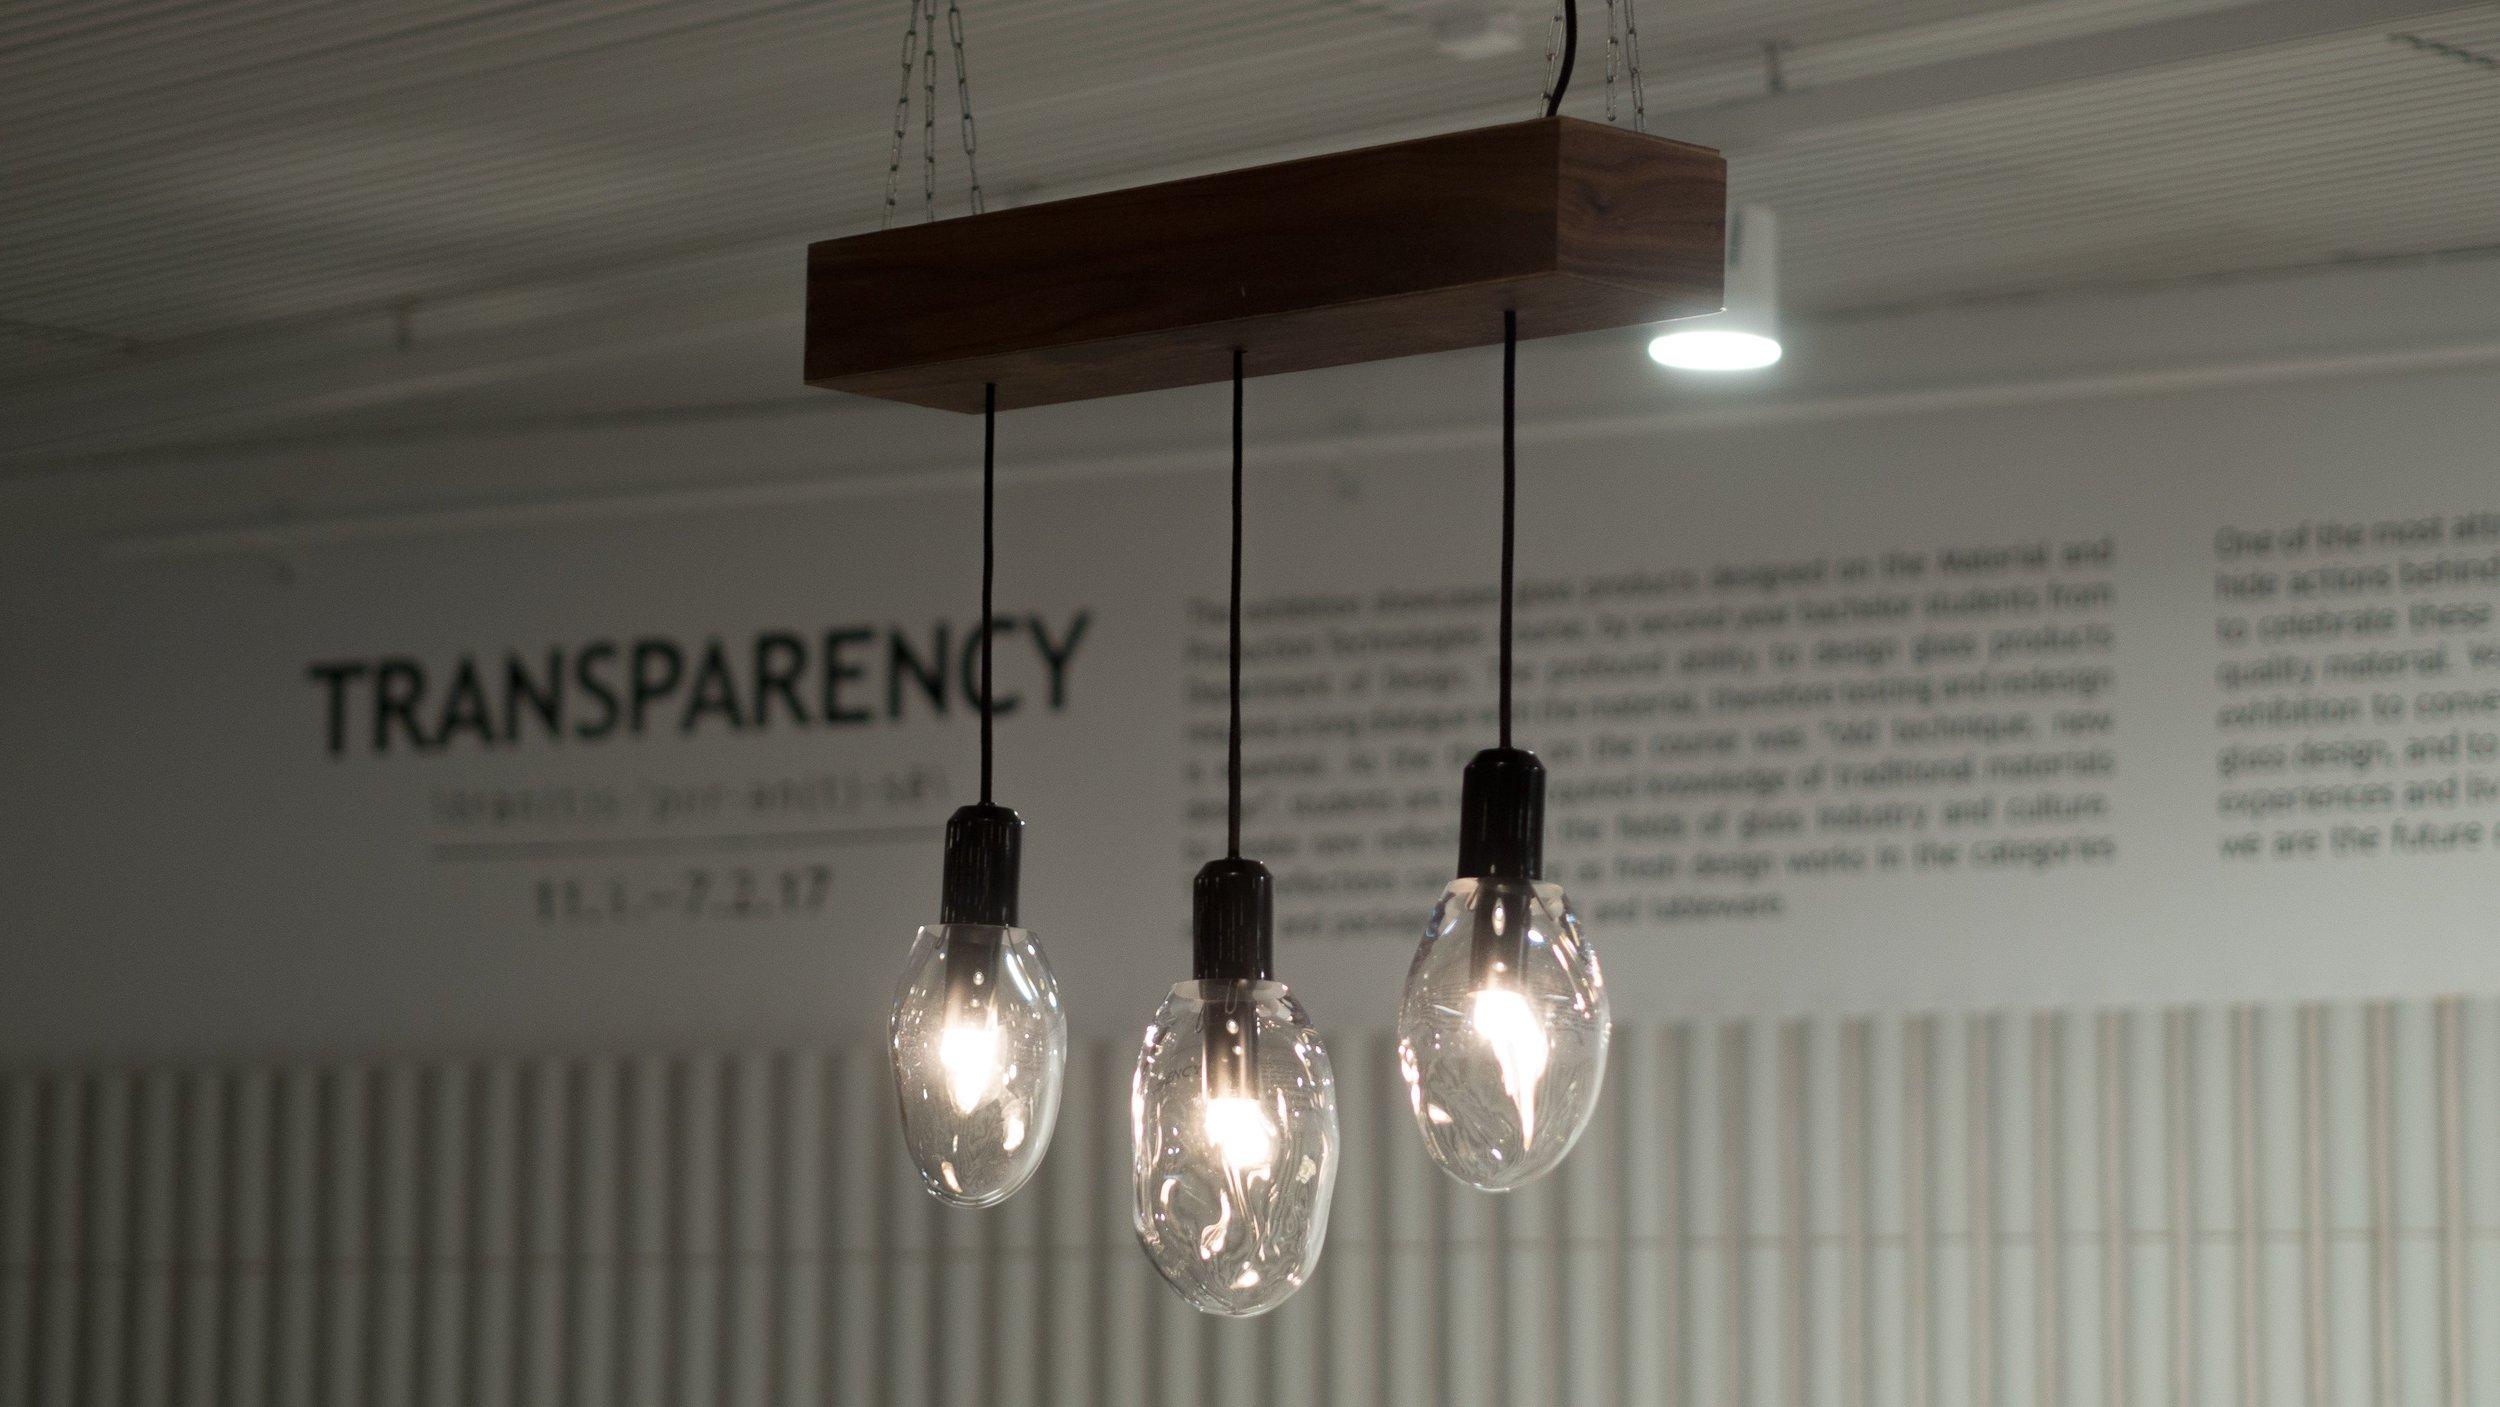 Transparency // Images: Miko Koskinen